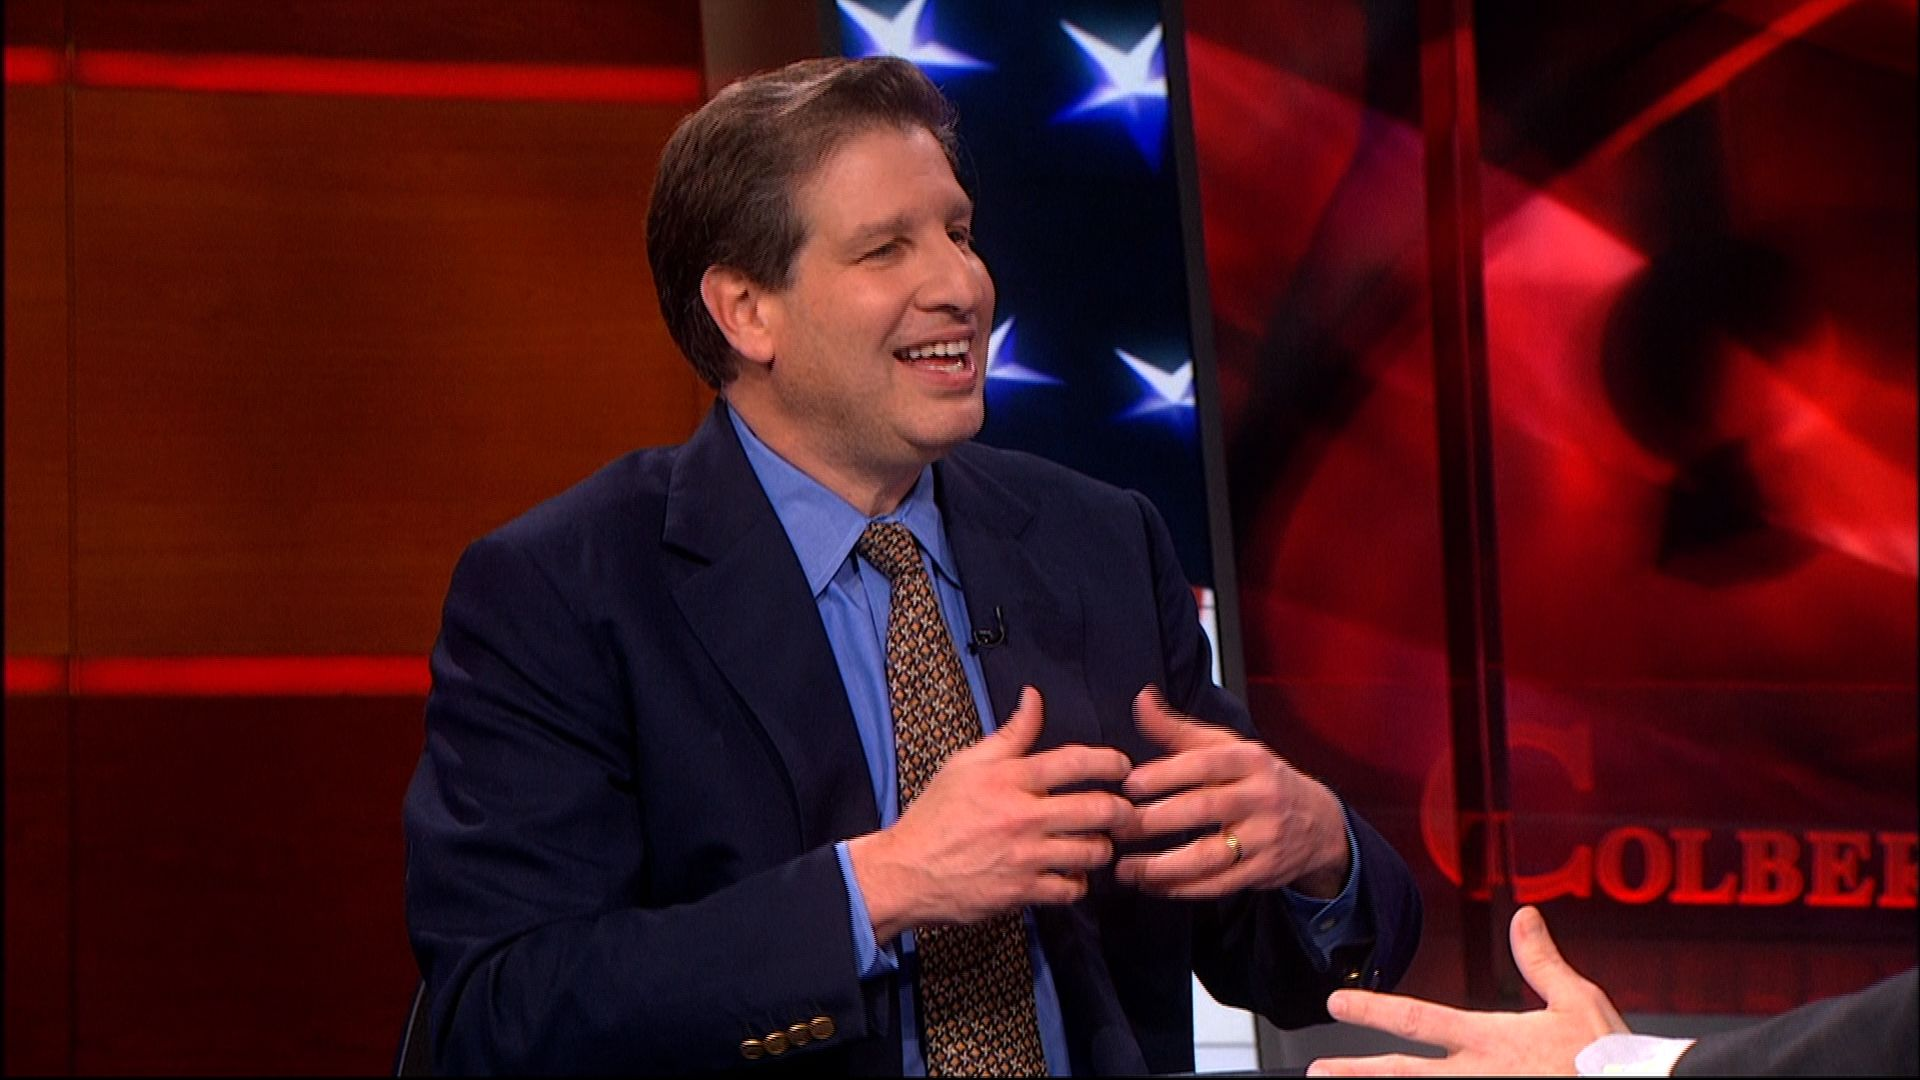 Crisis in Ukraine - Gideon Rose - The Colbert Report (Video Clip ...